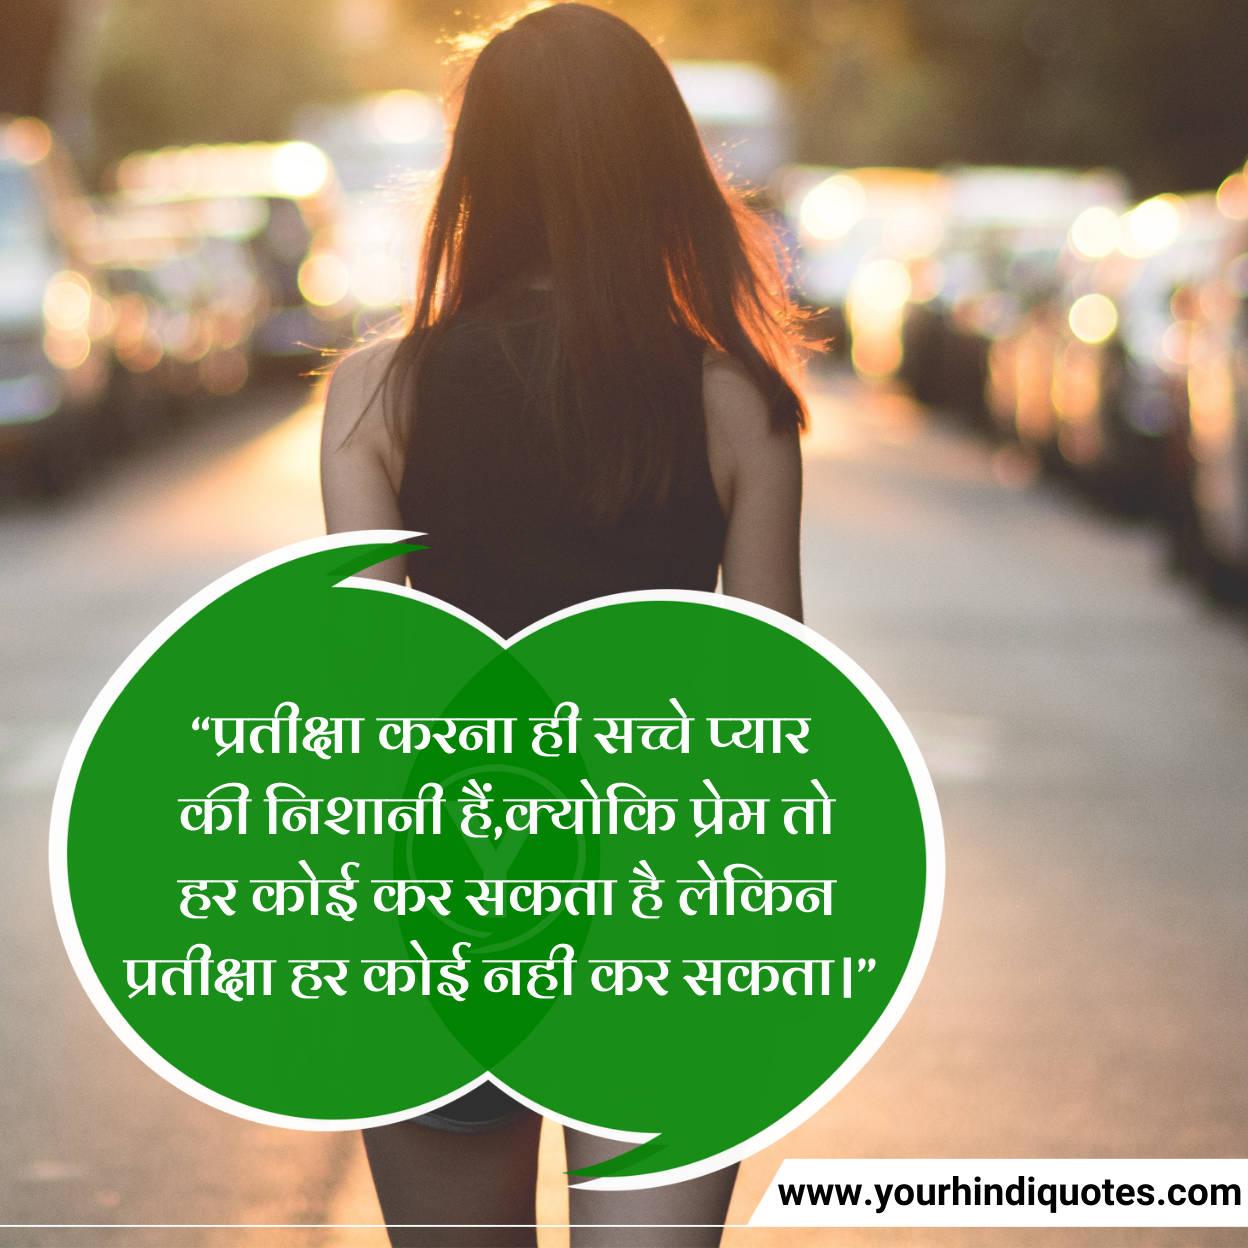 Pyar Status in Hindi Images Shayari Photos